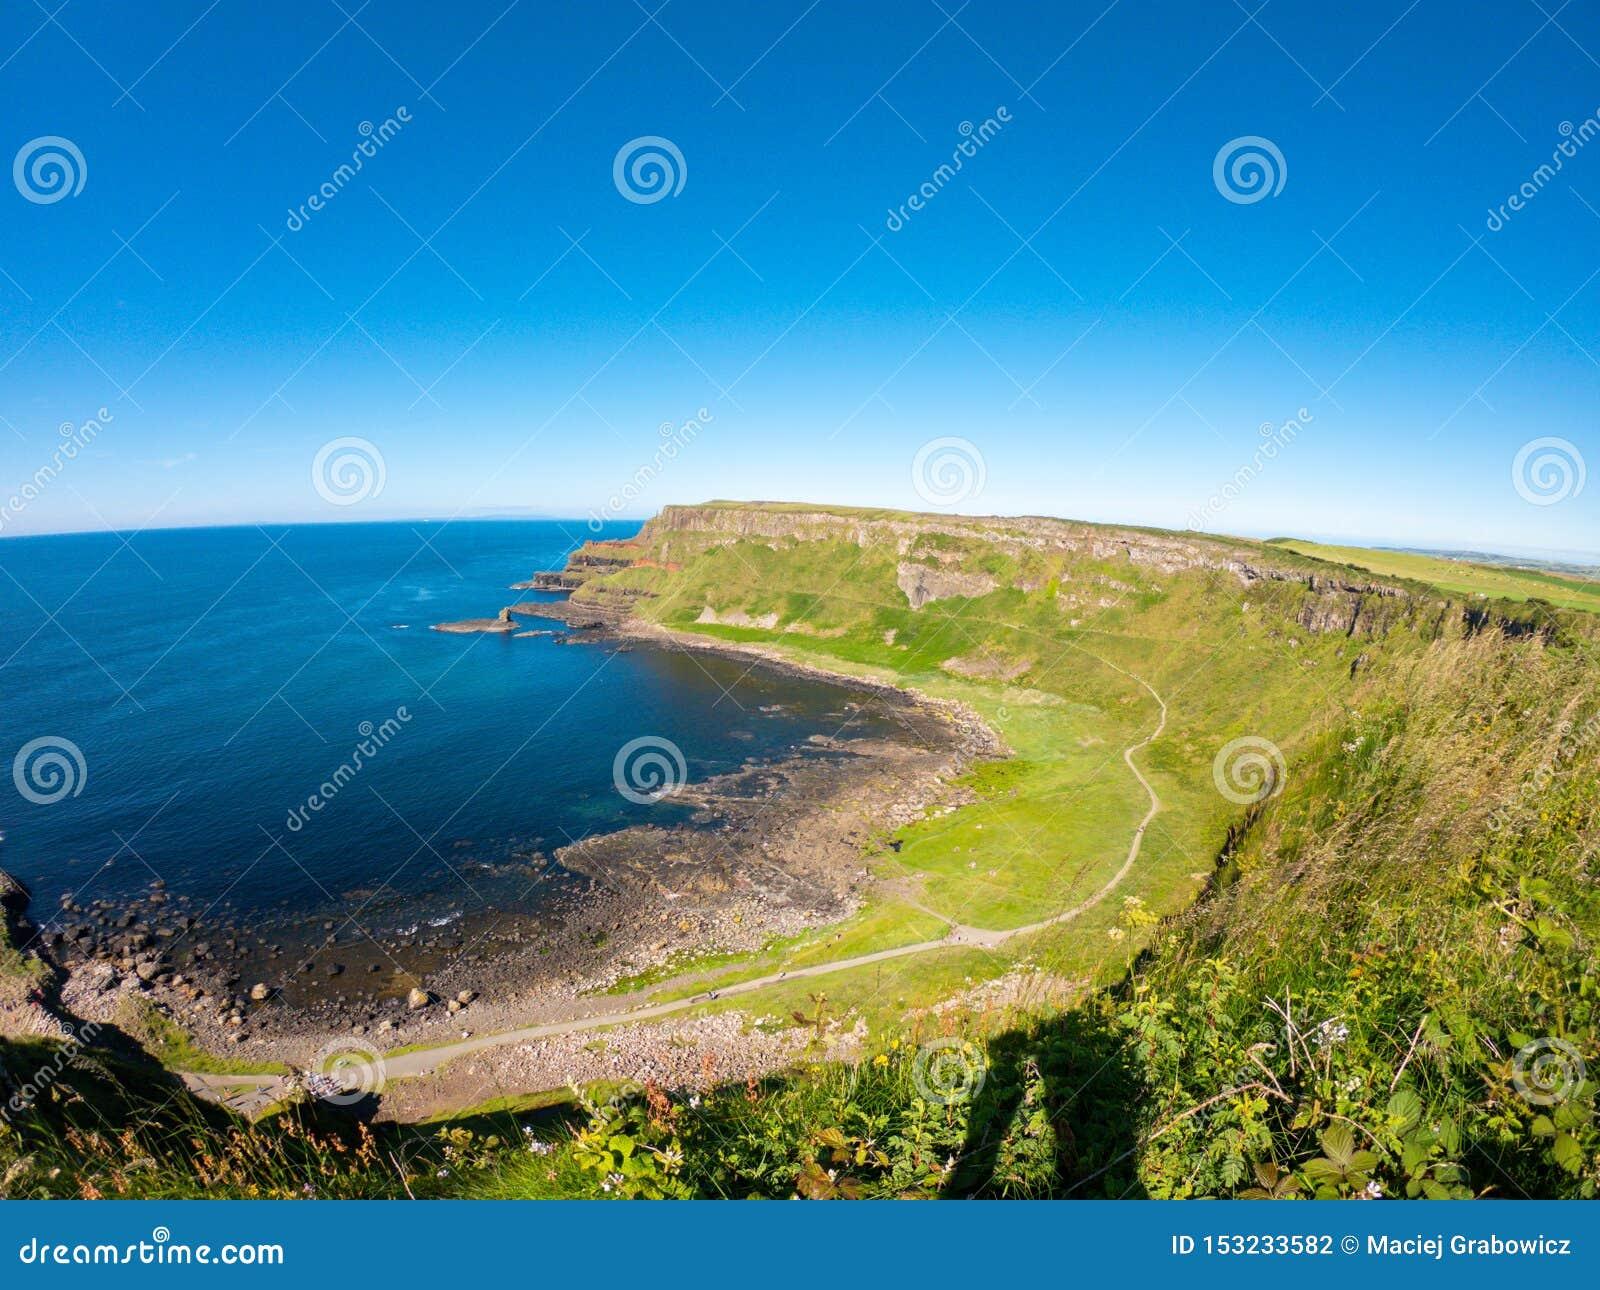 Giants Causeway Aerial view, basalt columns on North Coast of Northern Ireland near bushmills